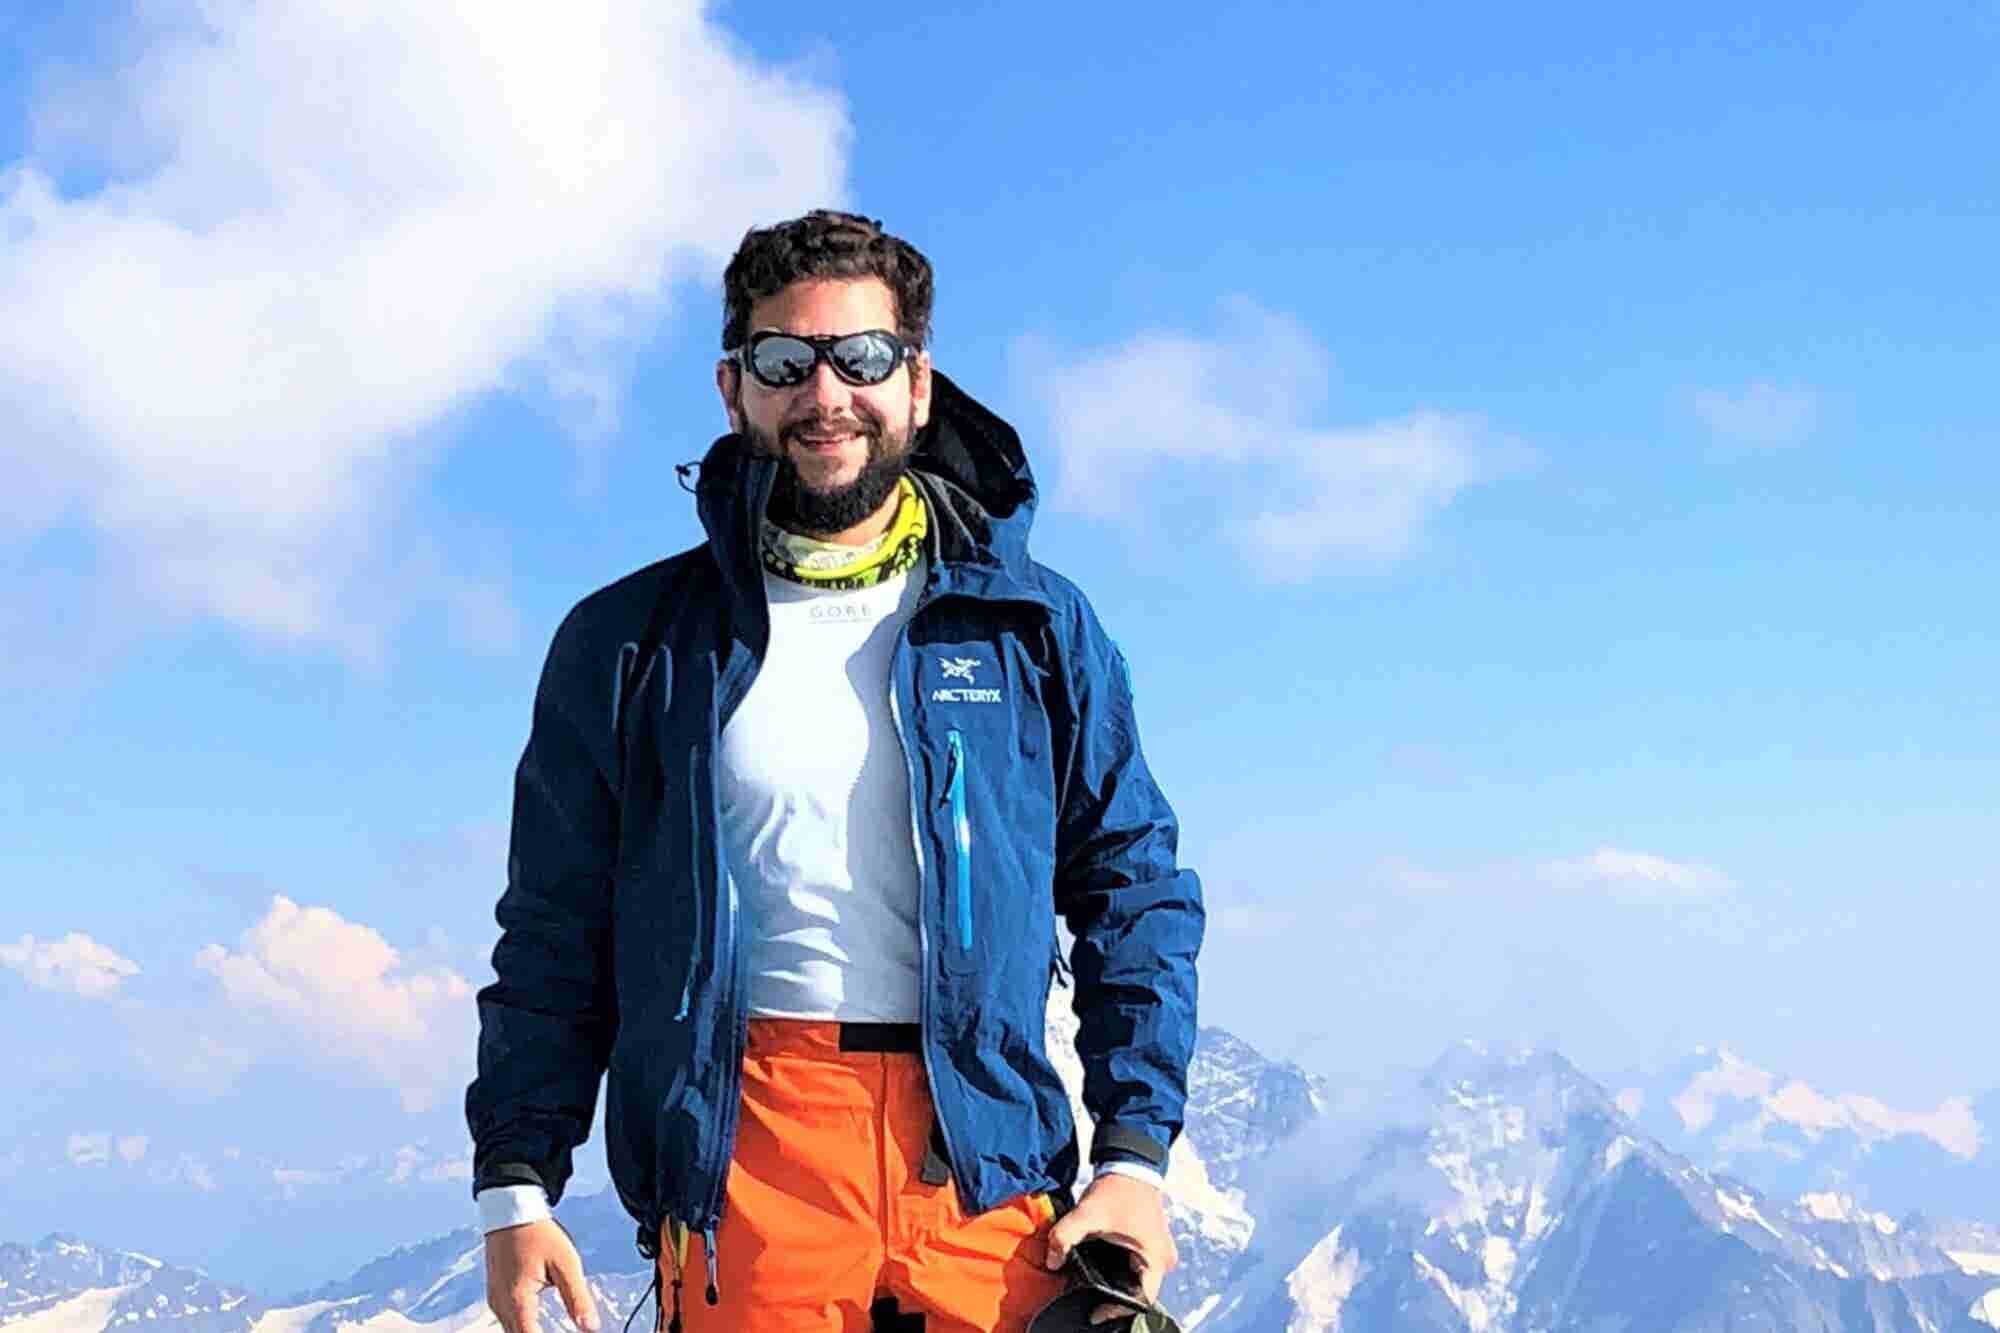 Be Extraordinary: OmniAthletes Co-Founder Dani Afiouni